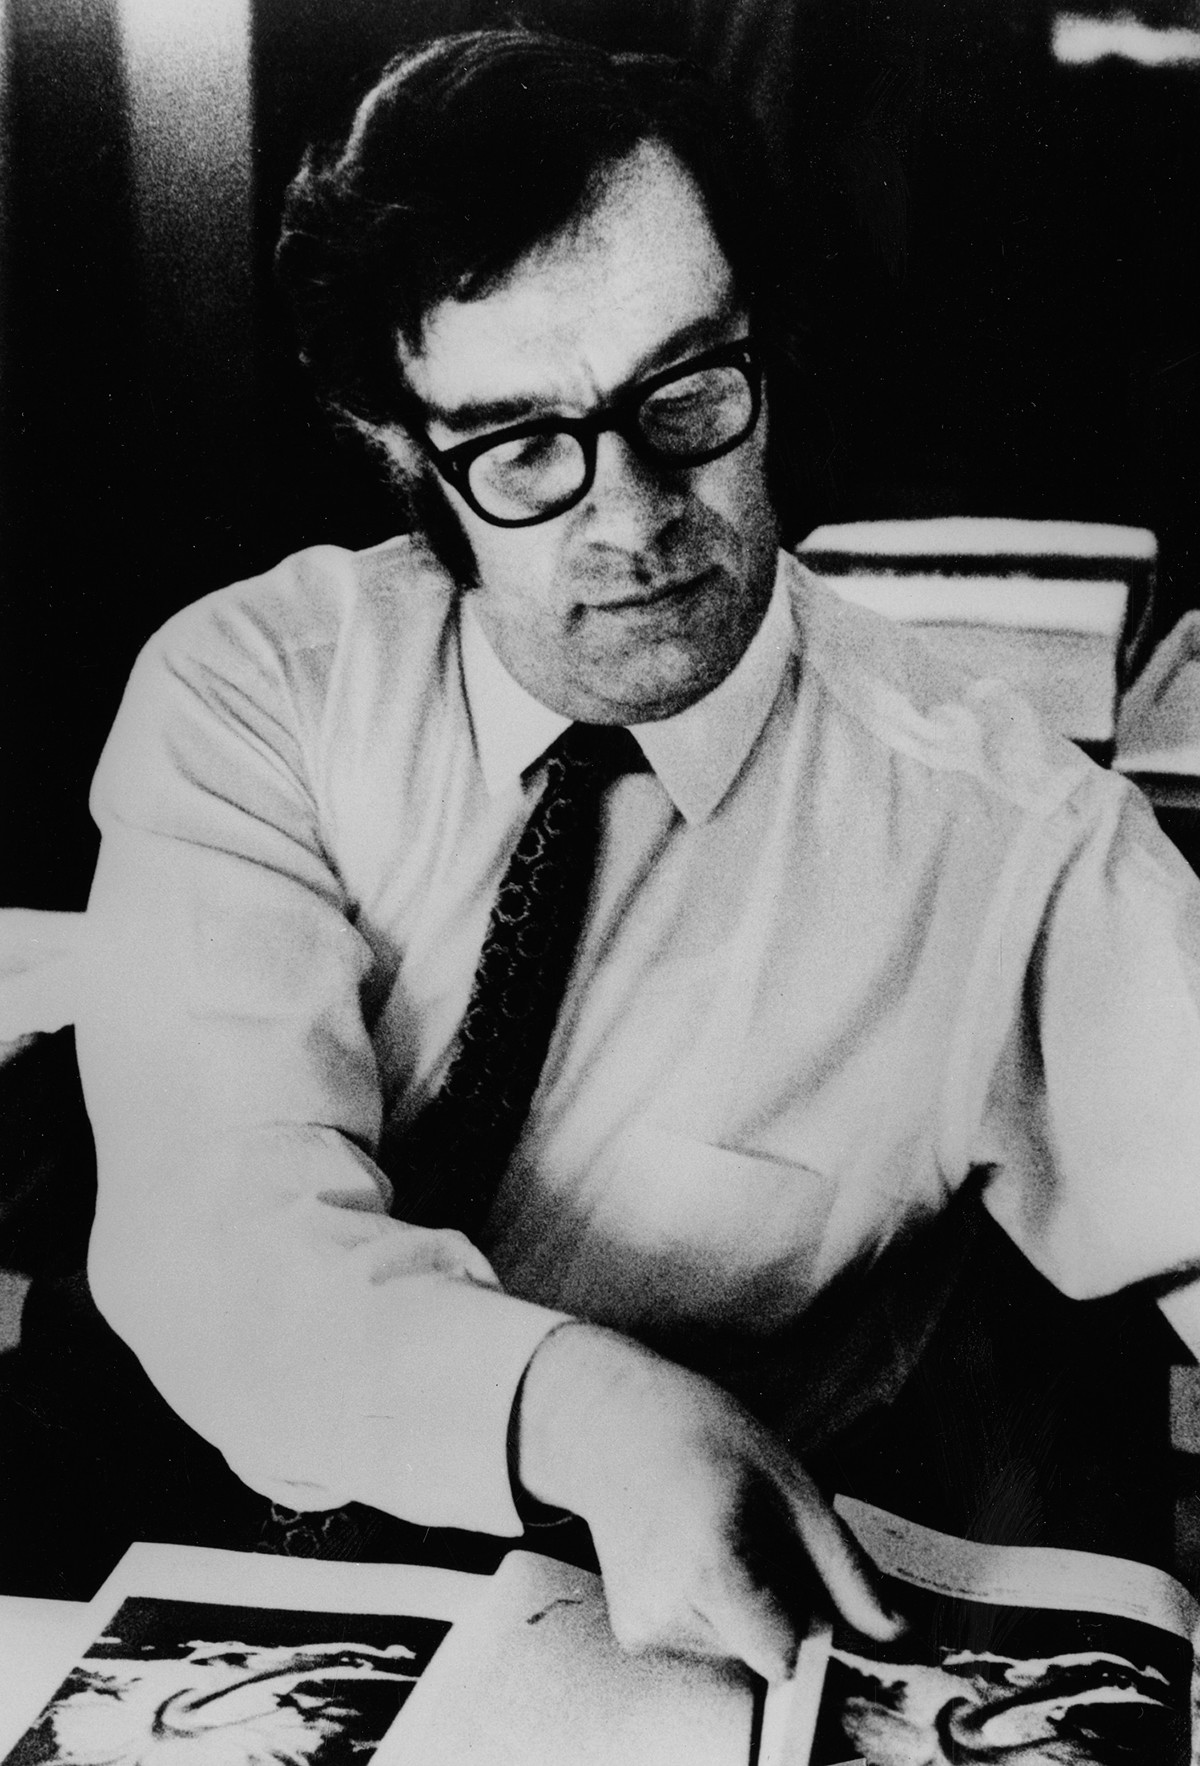 Isaac Asimov, tvorac tri zakona robotike.